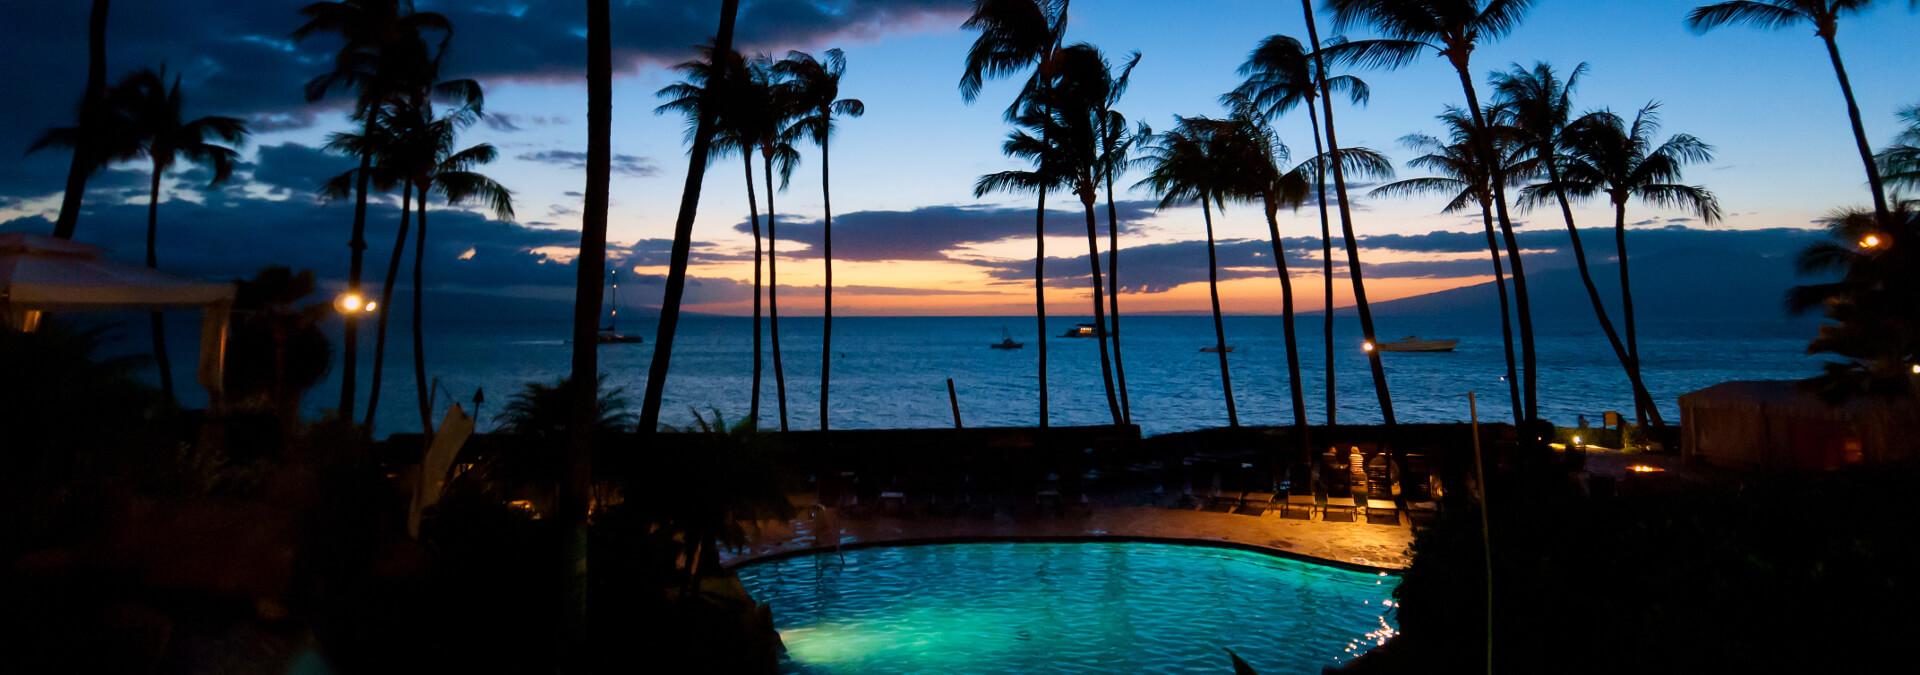 Westin Ka'anapali Ocean Resort